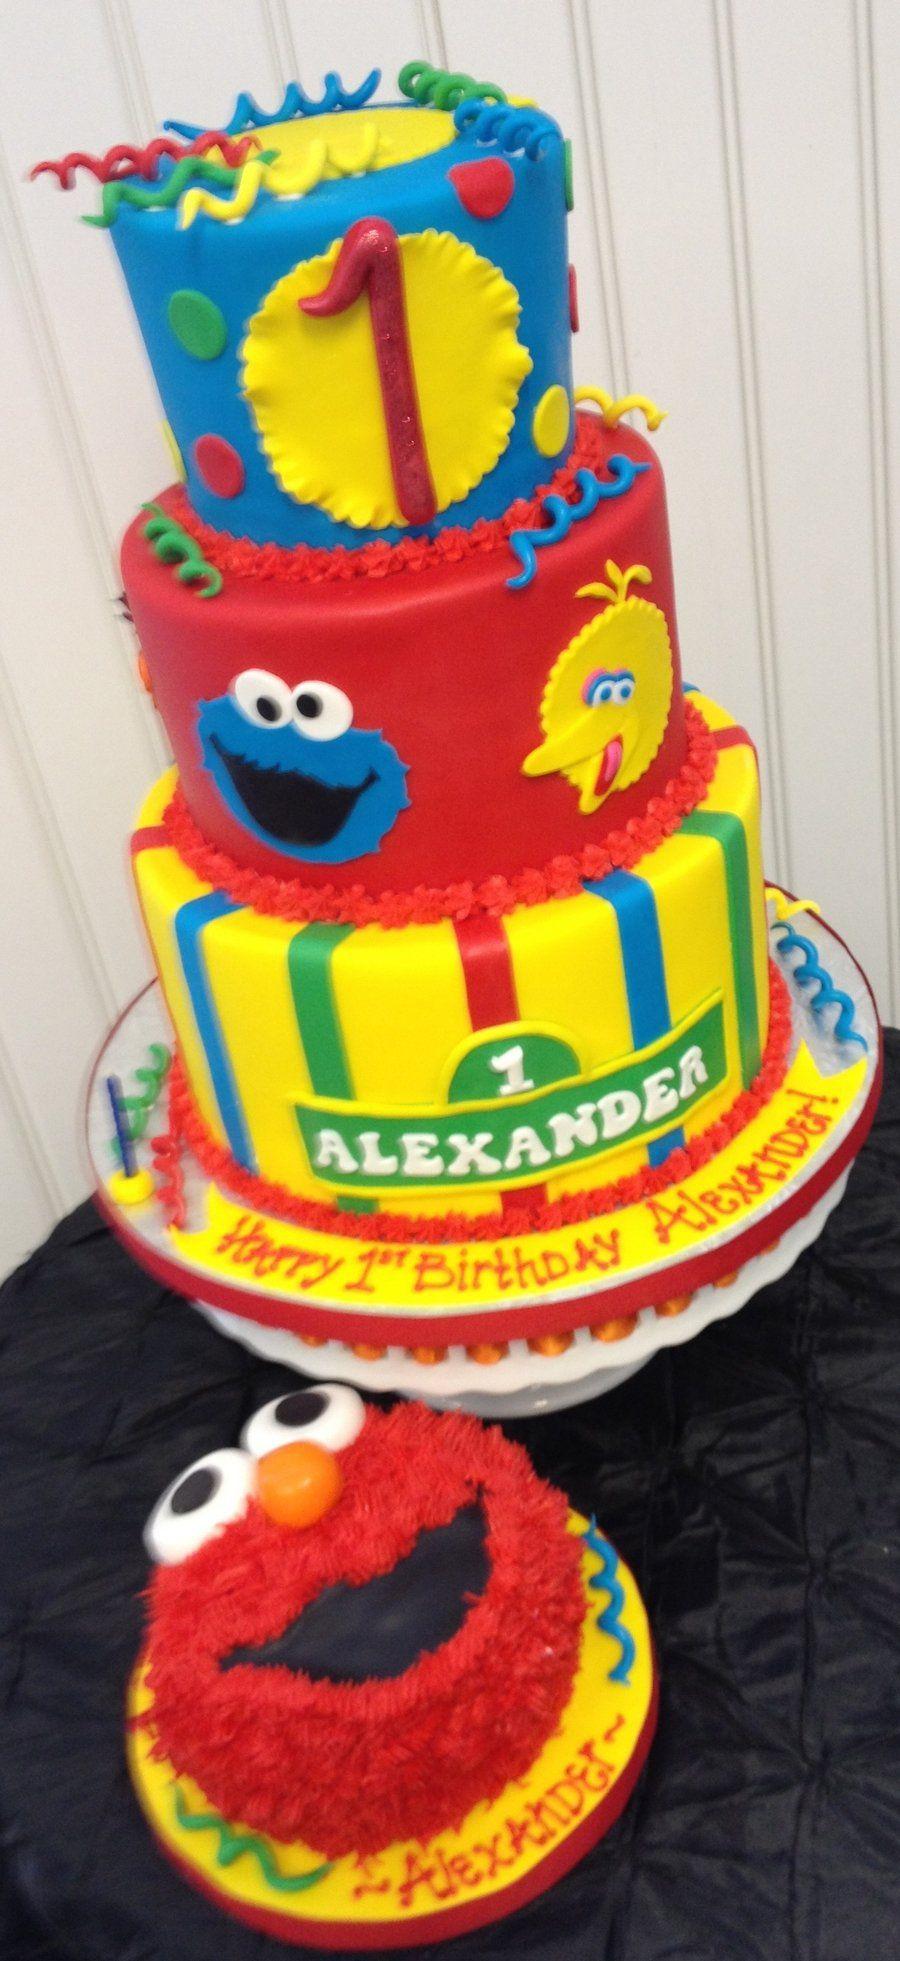 Sesame Street Birthday Cake on Cake Central RJ 1st birthday